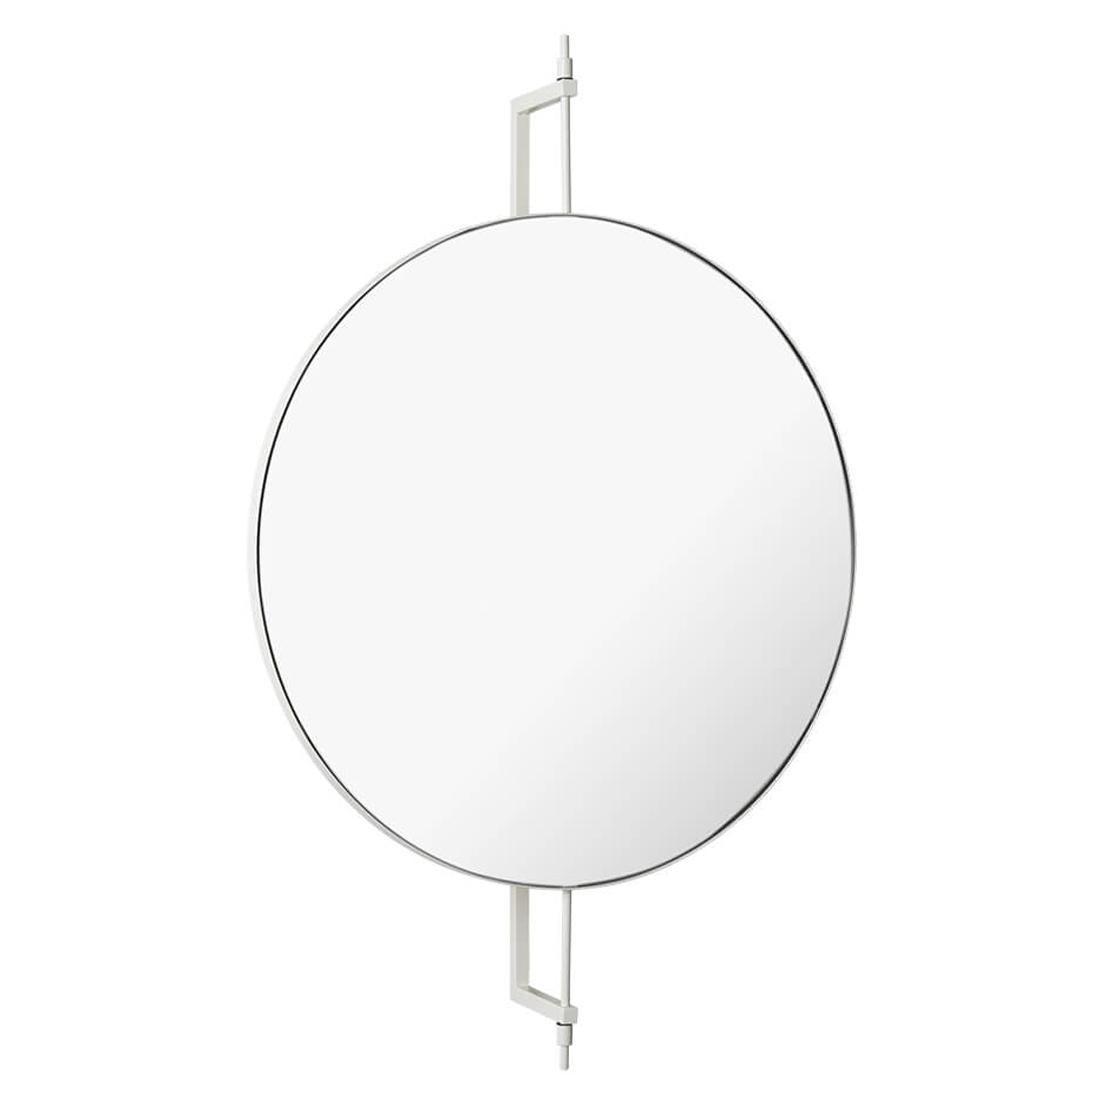 Beige Circle Rotating Mirror by Kristina Dam Studio